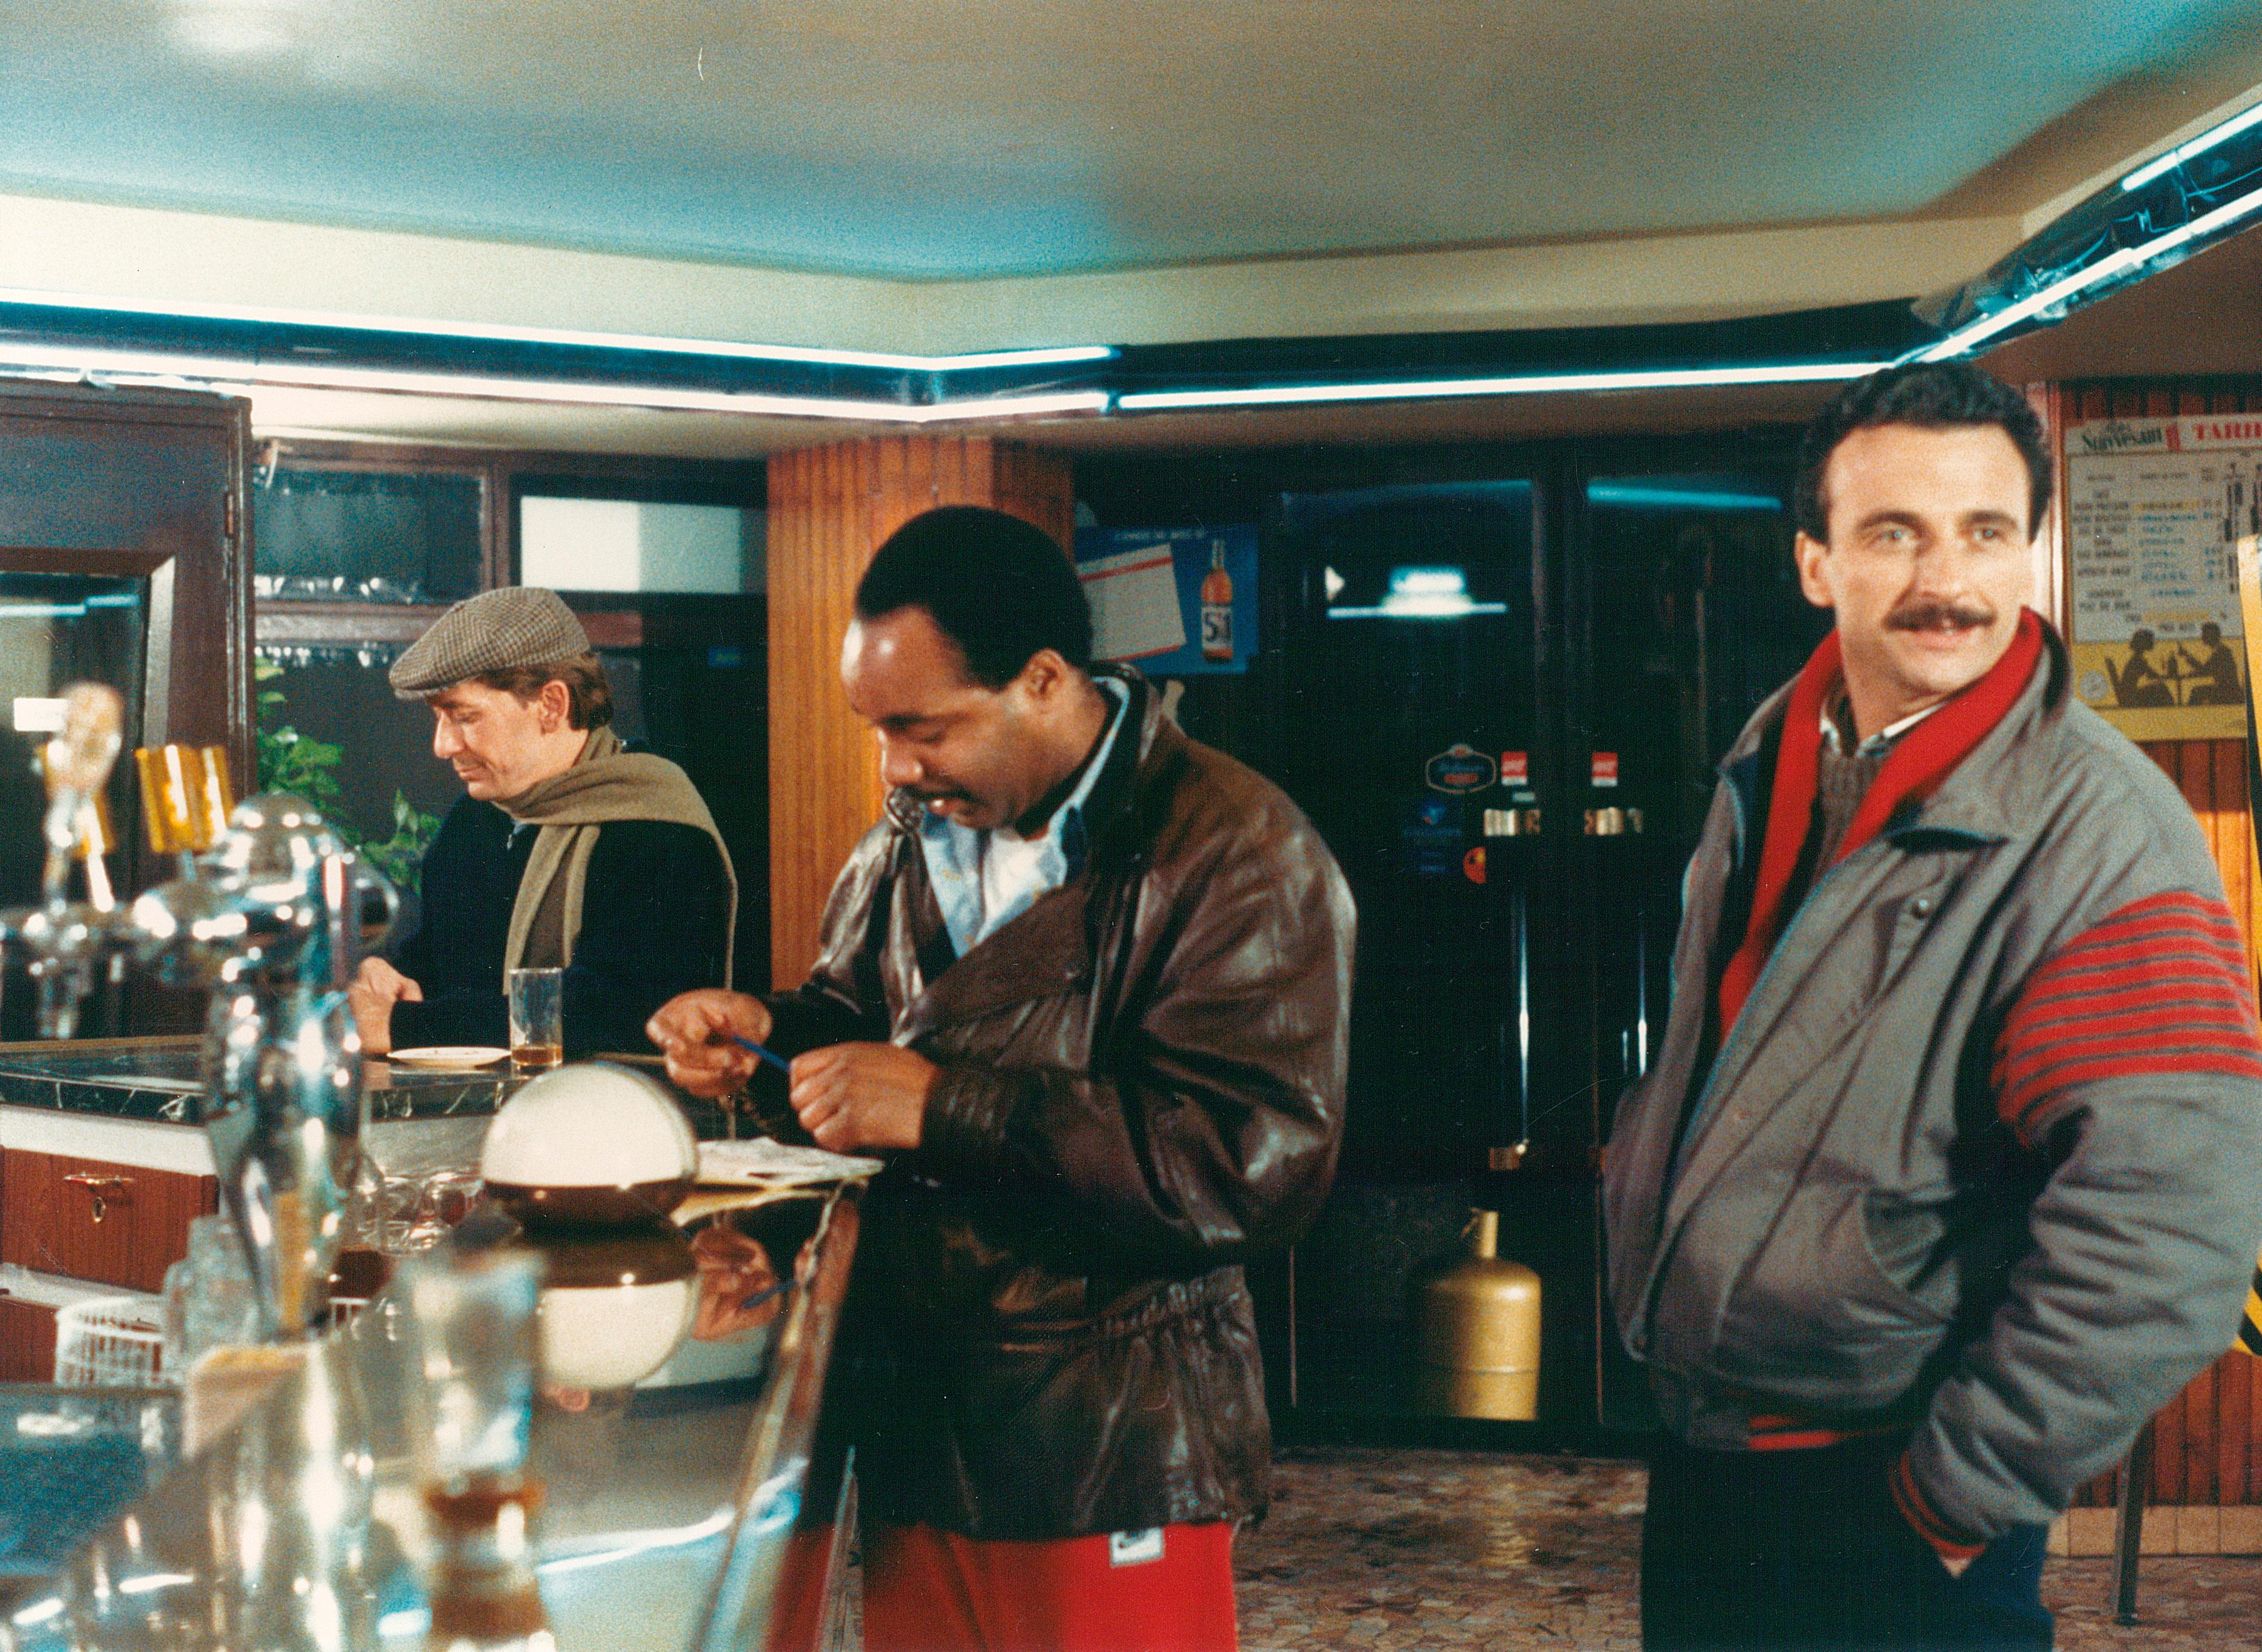 shellac-le-cafe-des-jules-image-4272-copyright-shellac.jpg